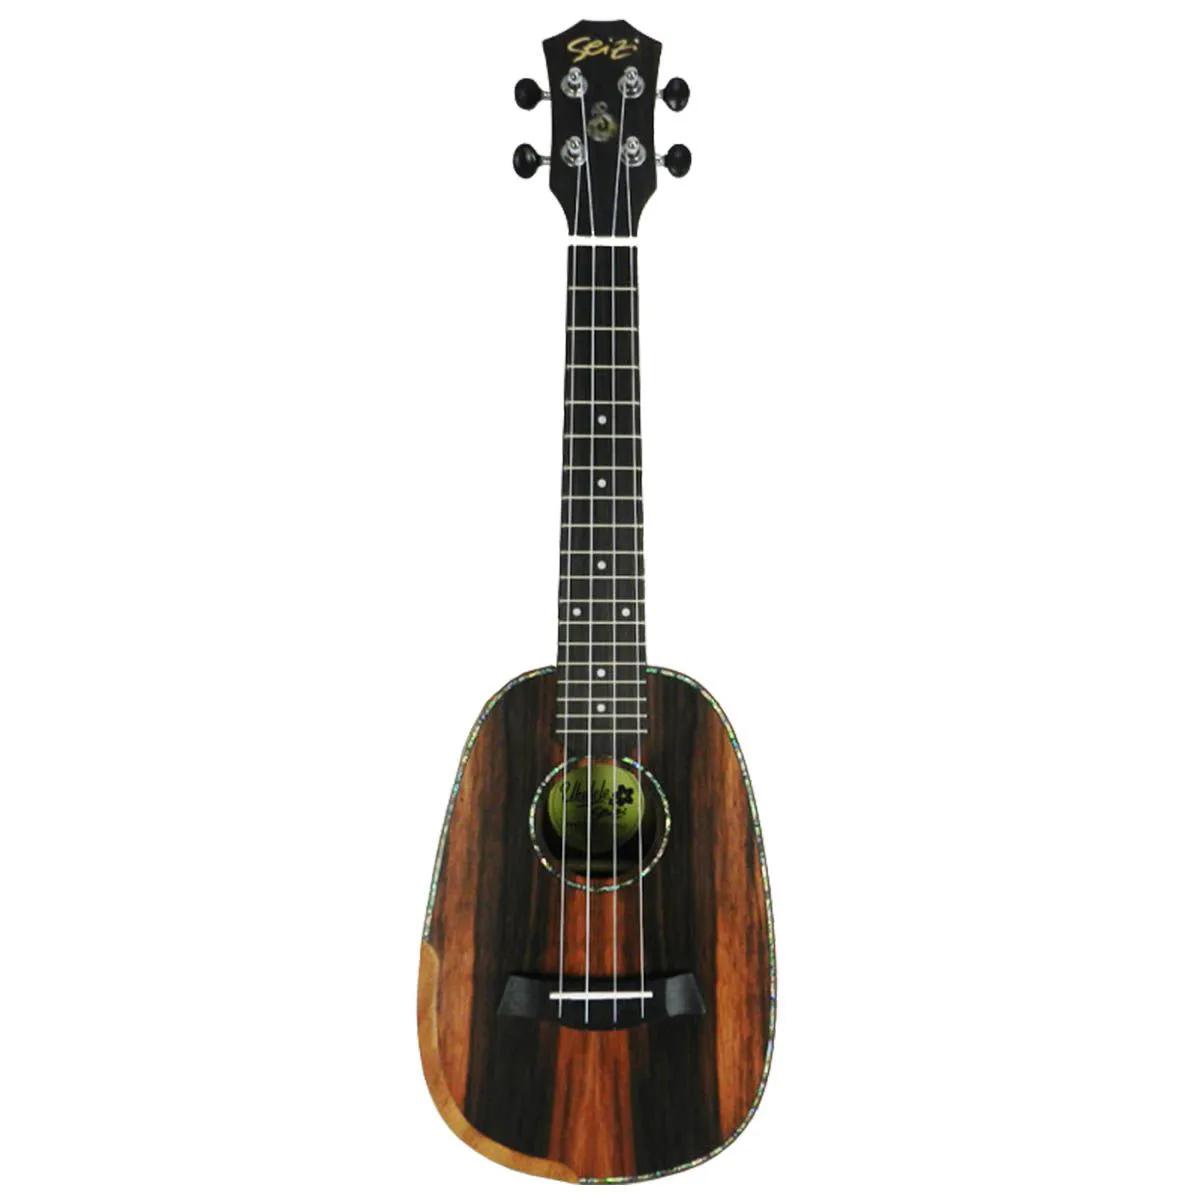 Ukulele Acústico Seizi Bora-Bora Pineapple Concert Ebony